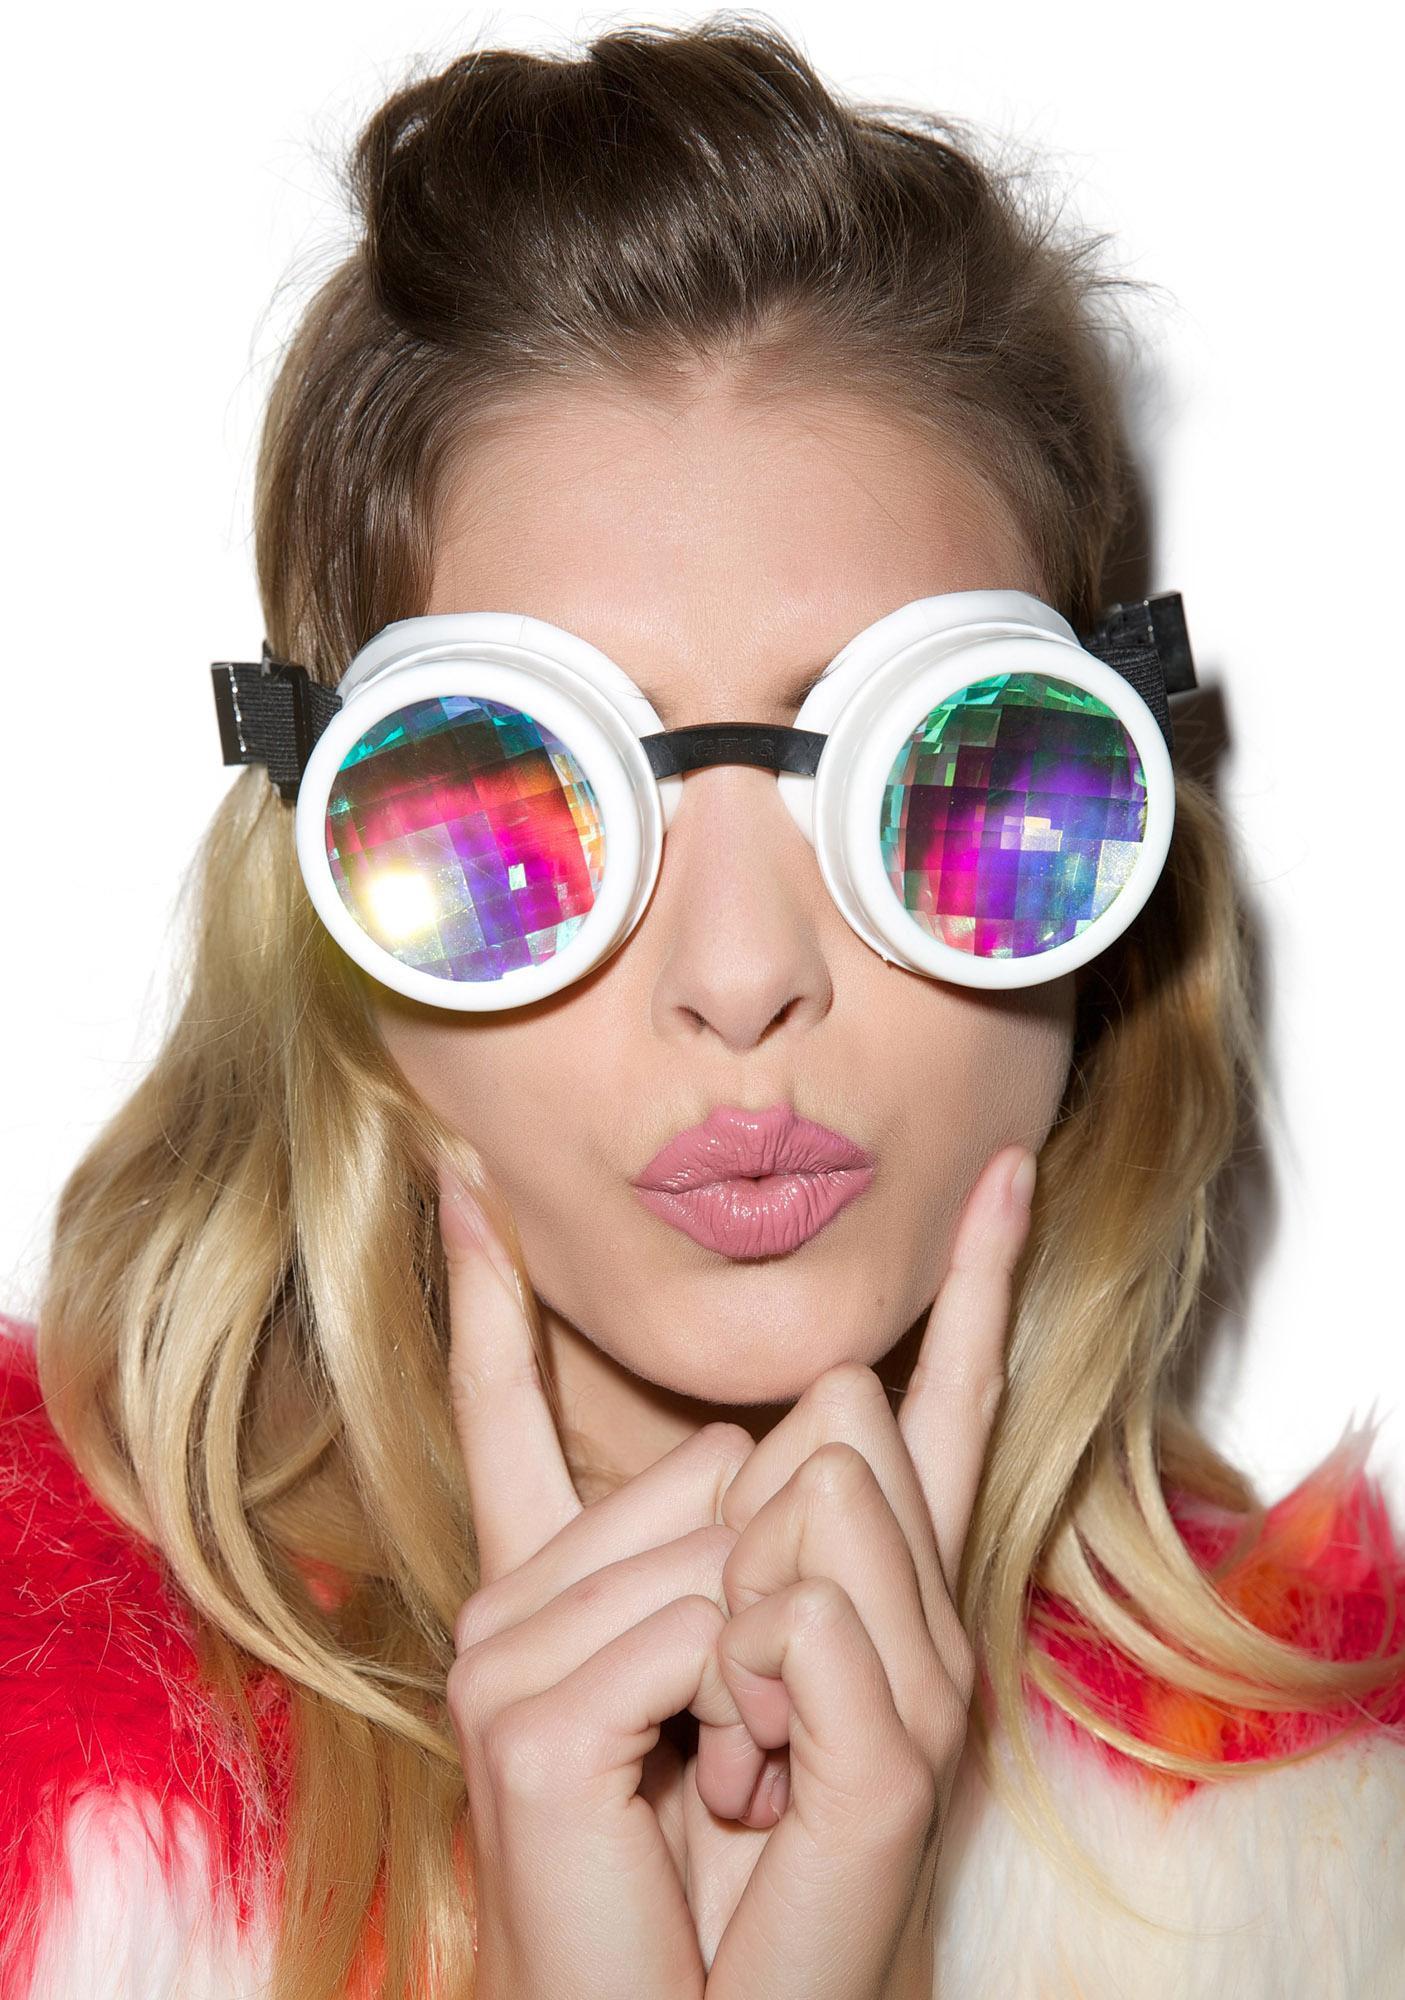 H0les Eyewear Get Em' Hard Goggles